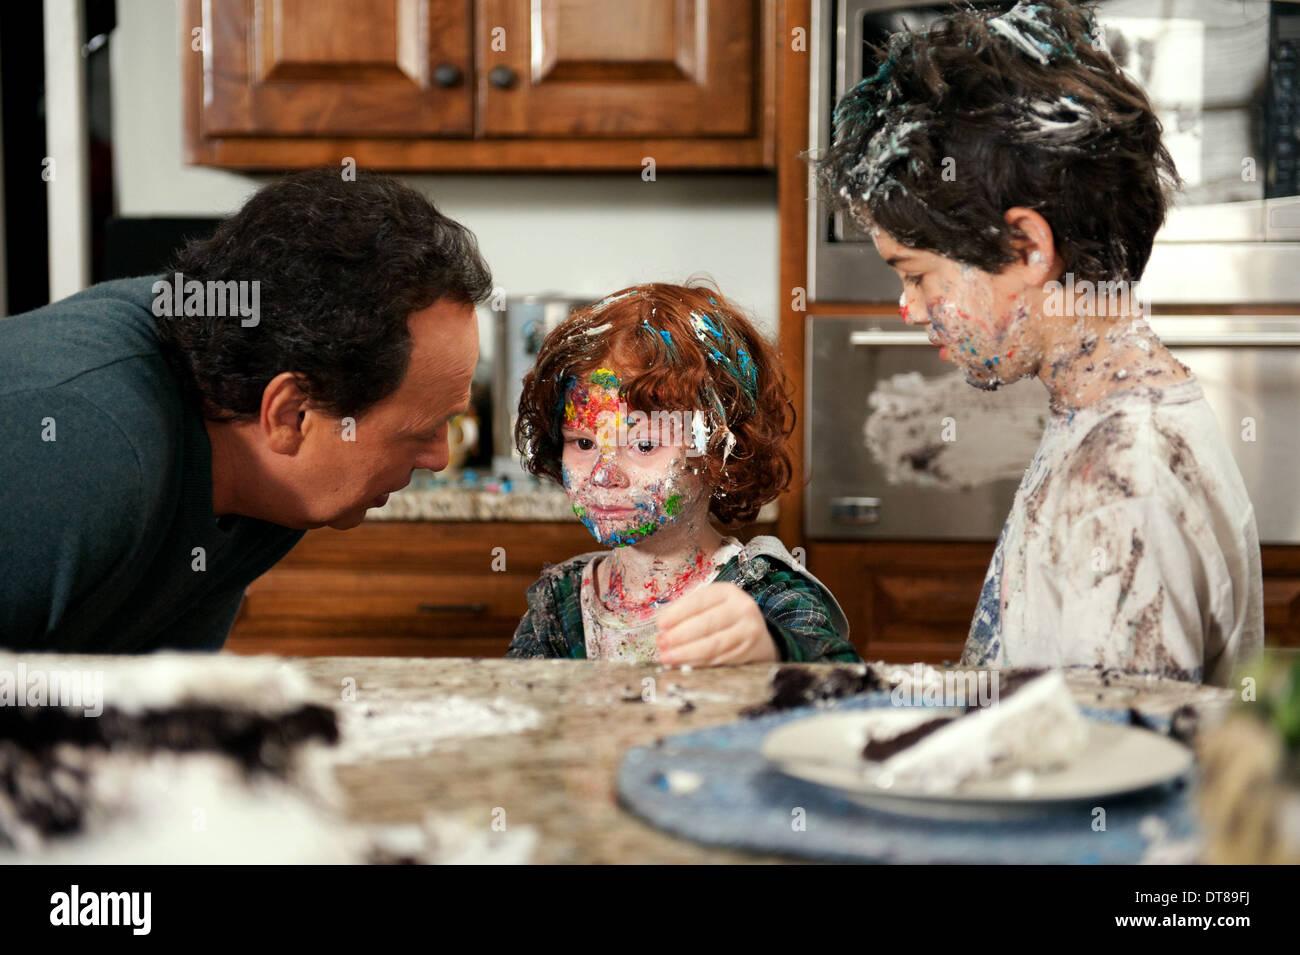 BILLY CRYSTAL KYLE HARRISON BREITKOPF & JOSHUA RUSH PARENTAL GUIDANCE (2012) - Stock Image